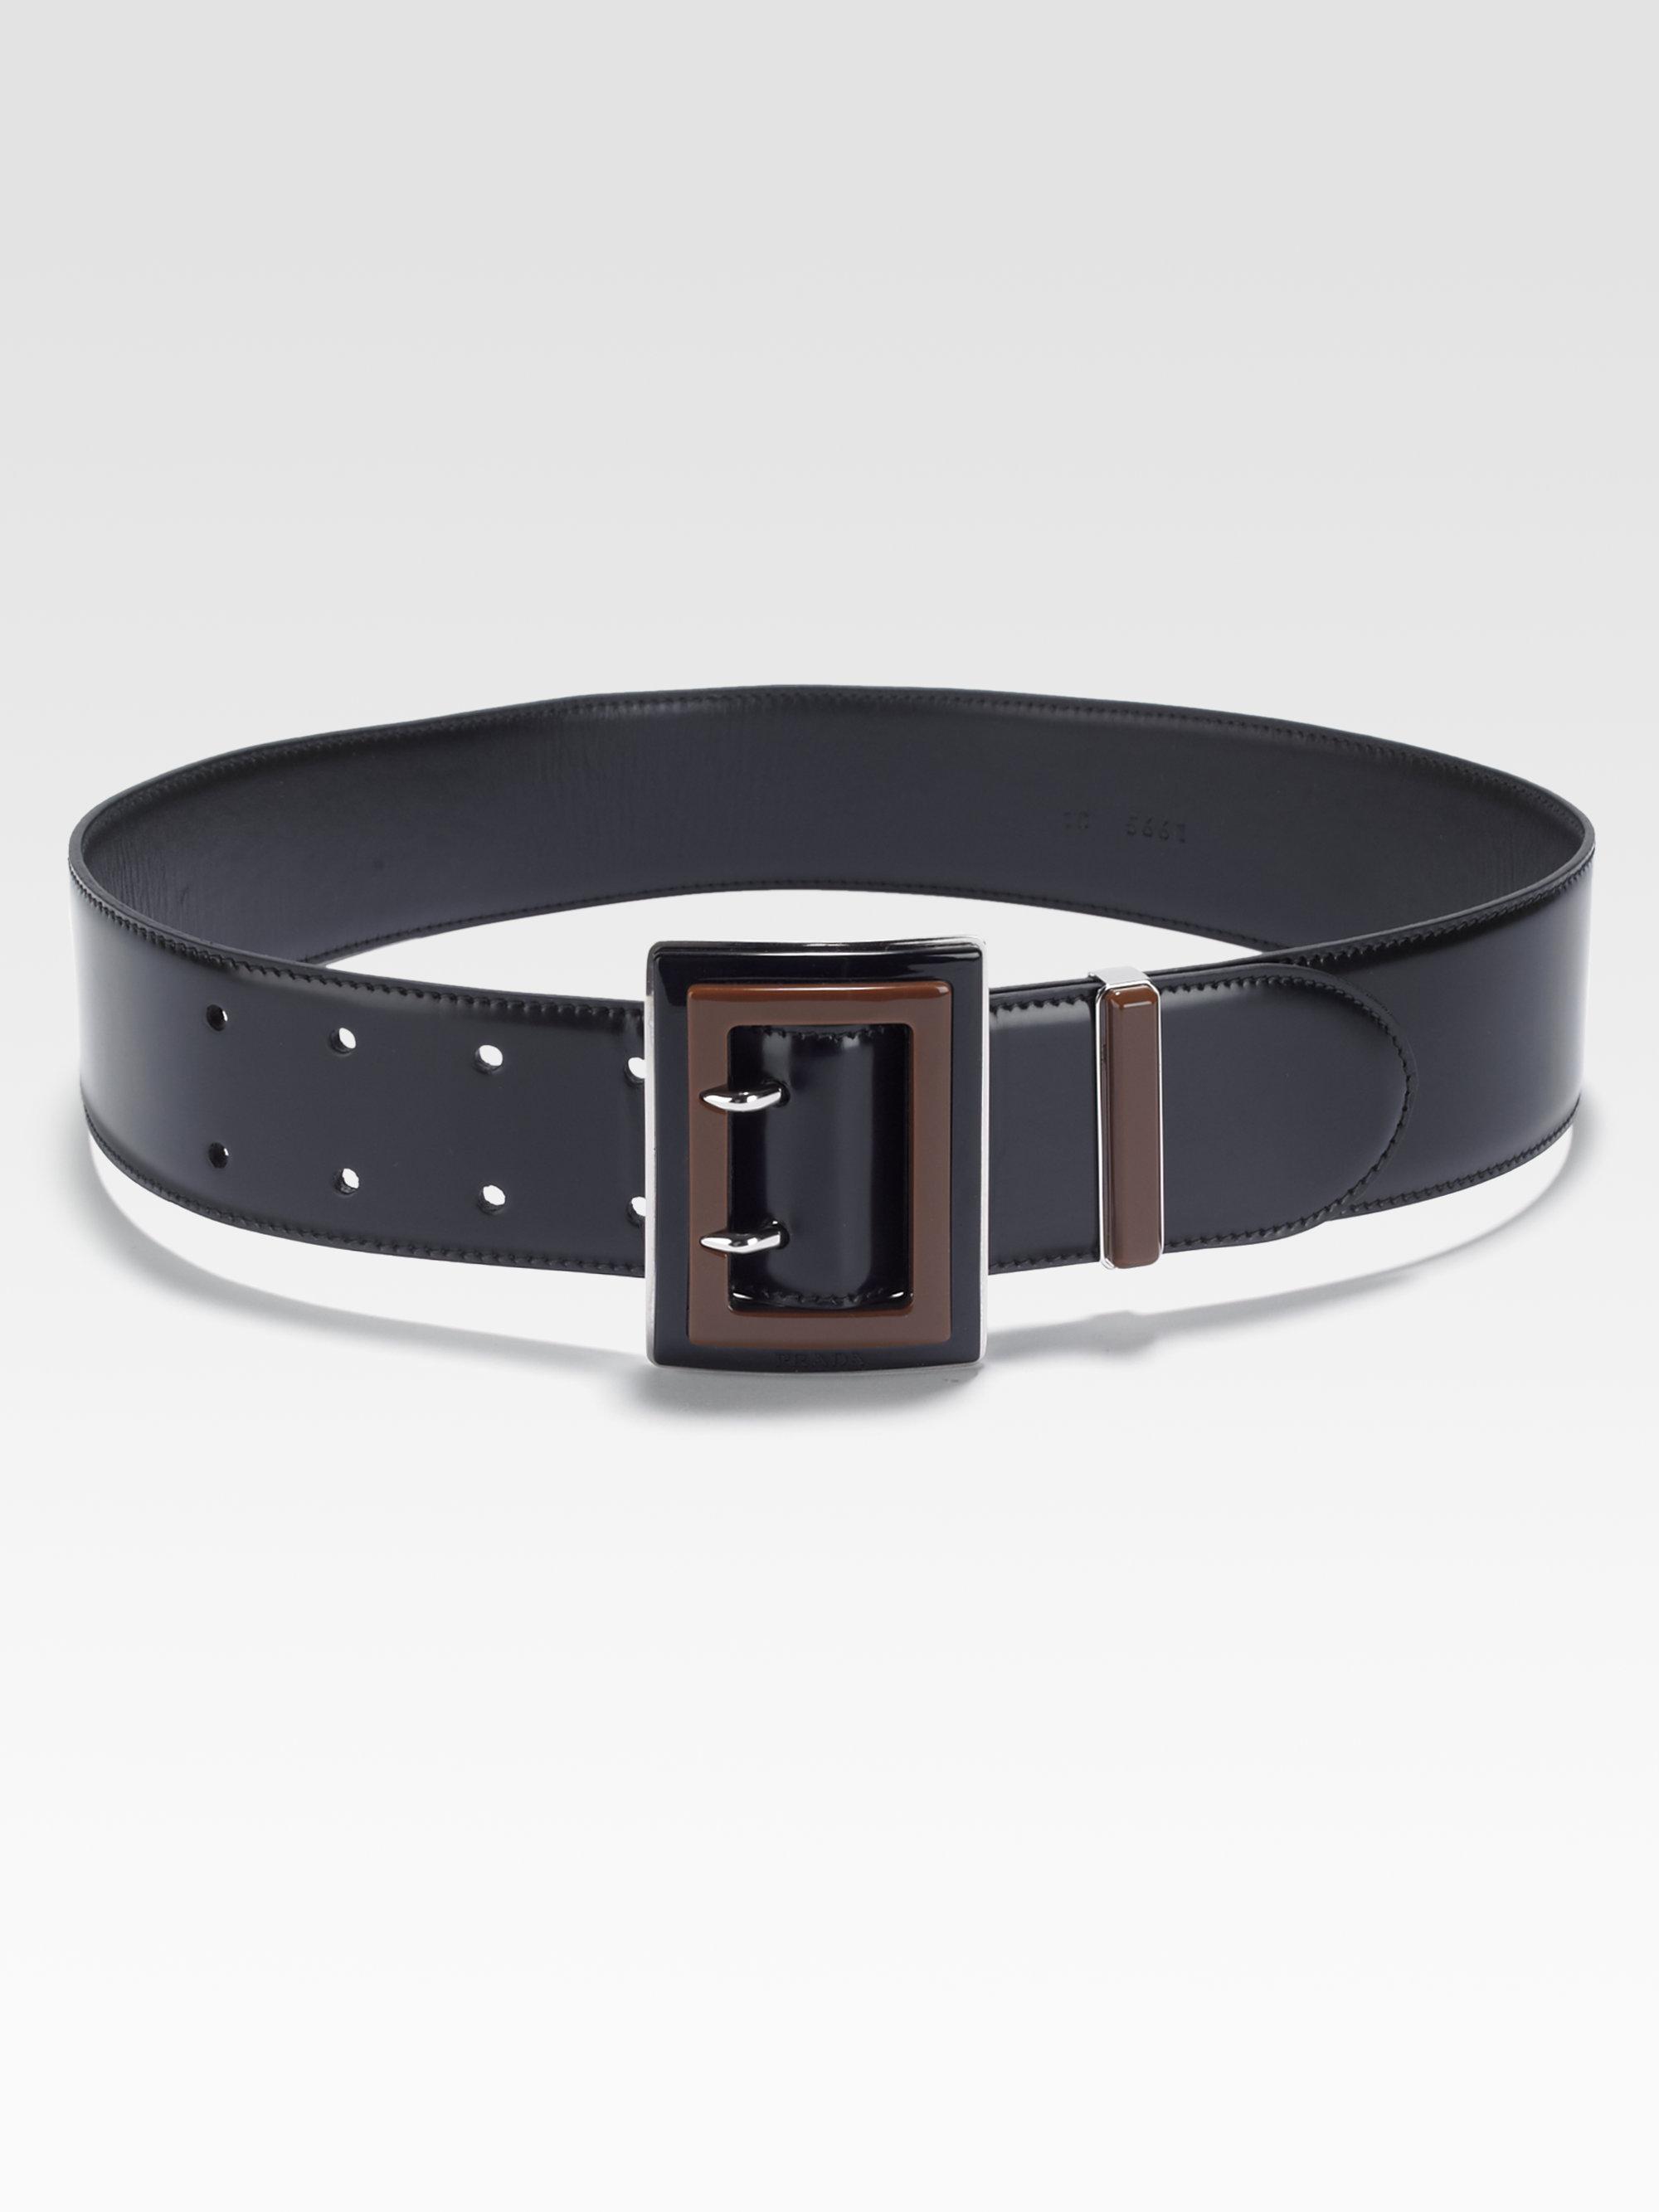 prada wallet price - prada blue leather belt